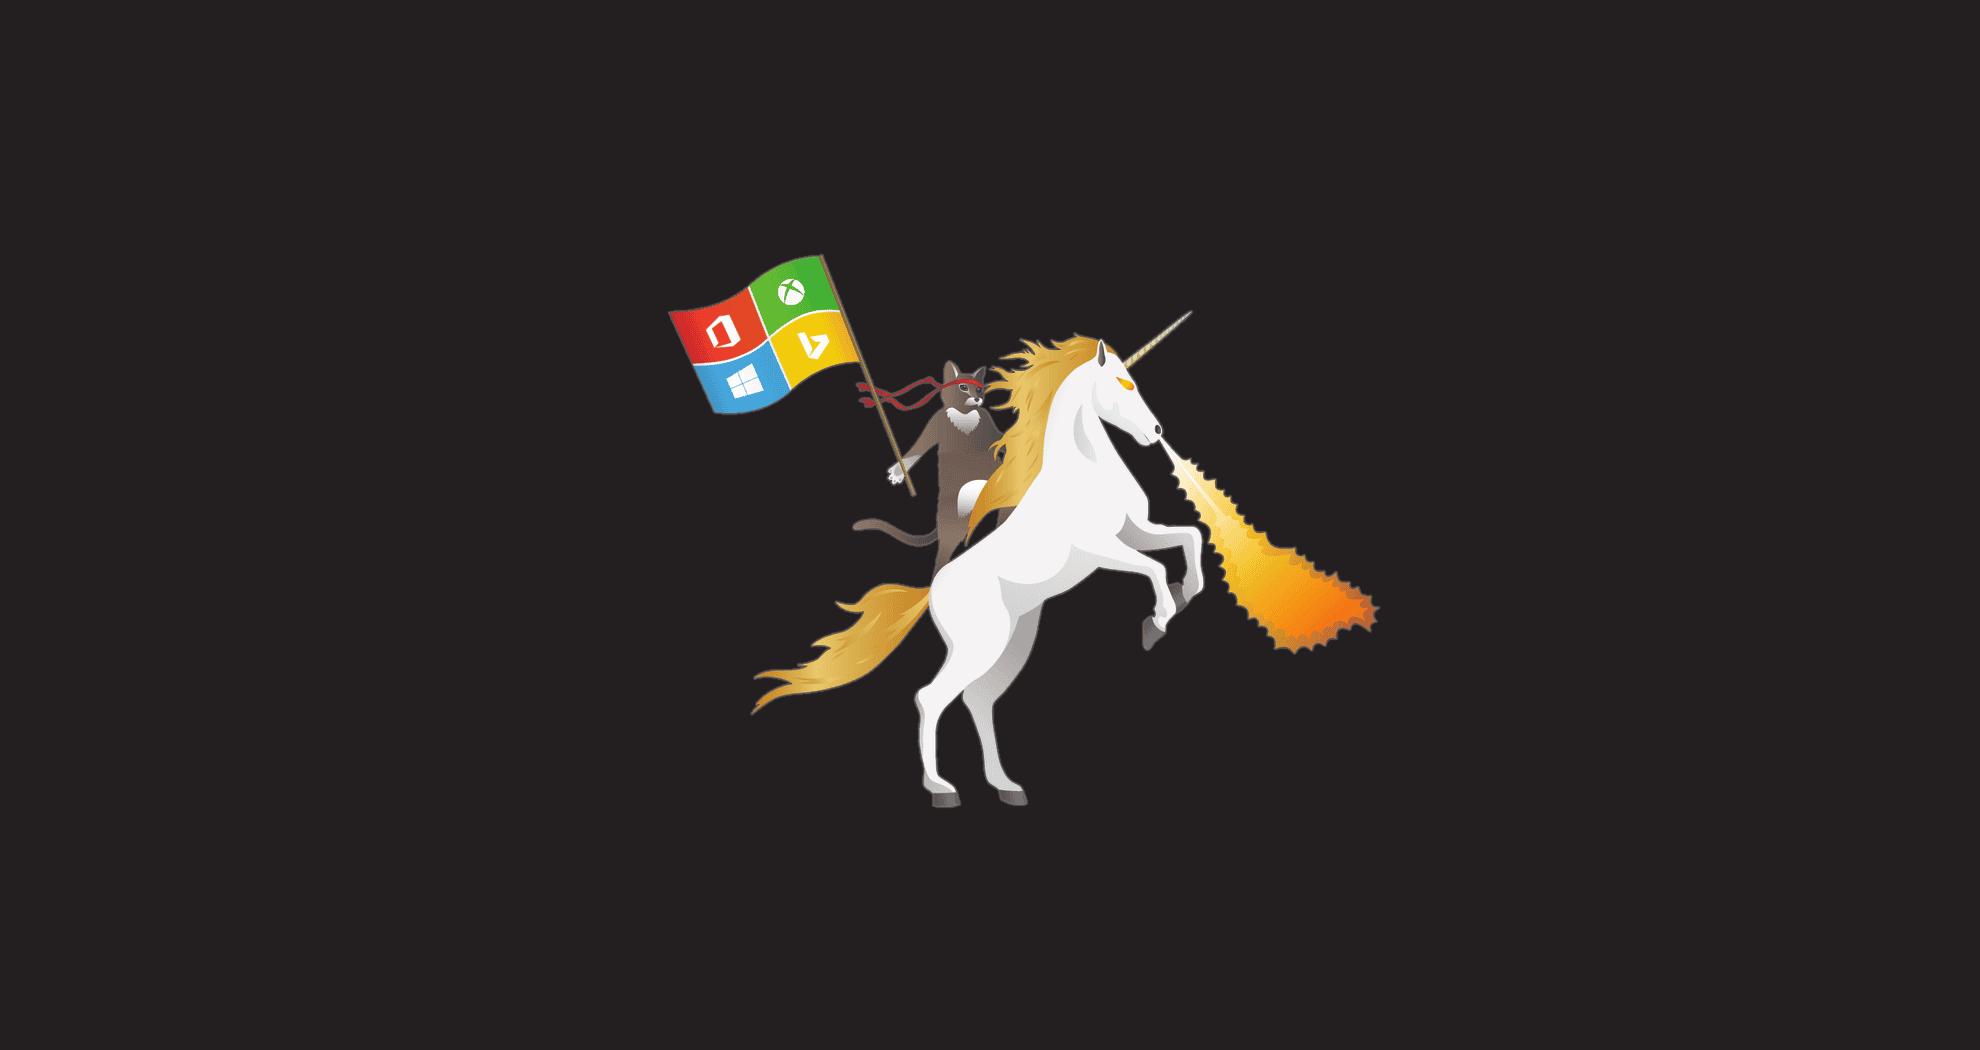 MS-ninjacat-unicorn-office-xbox-windows-bing